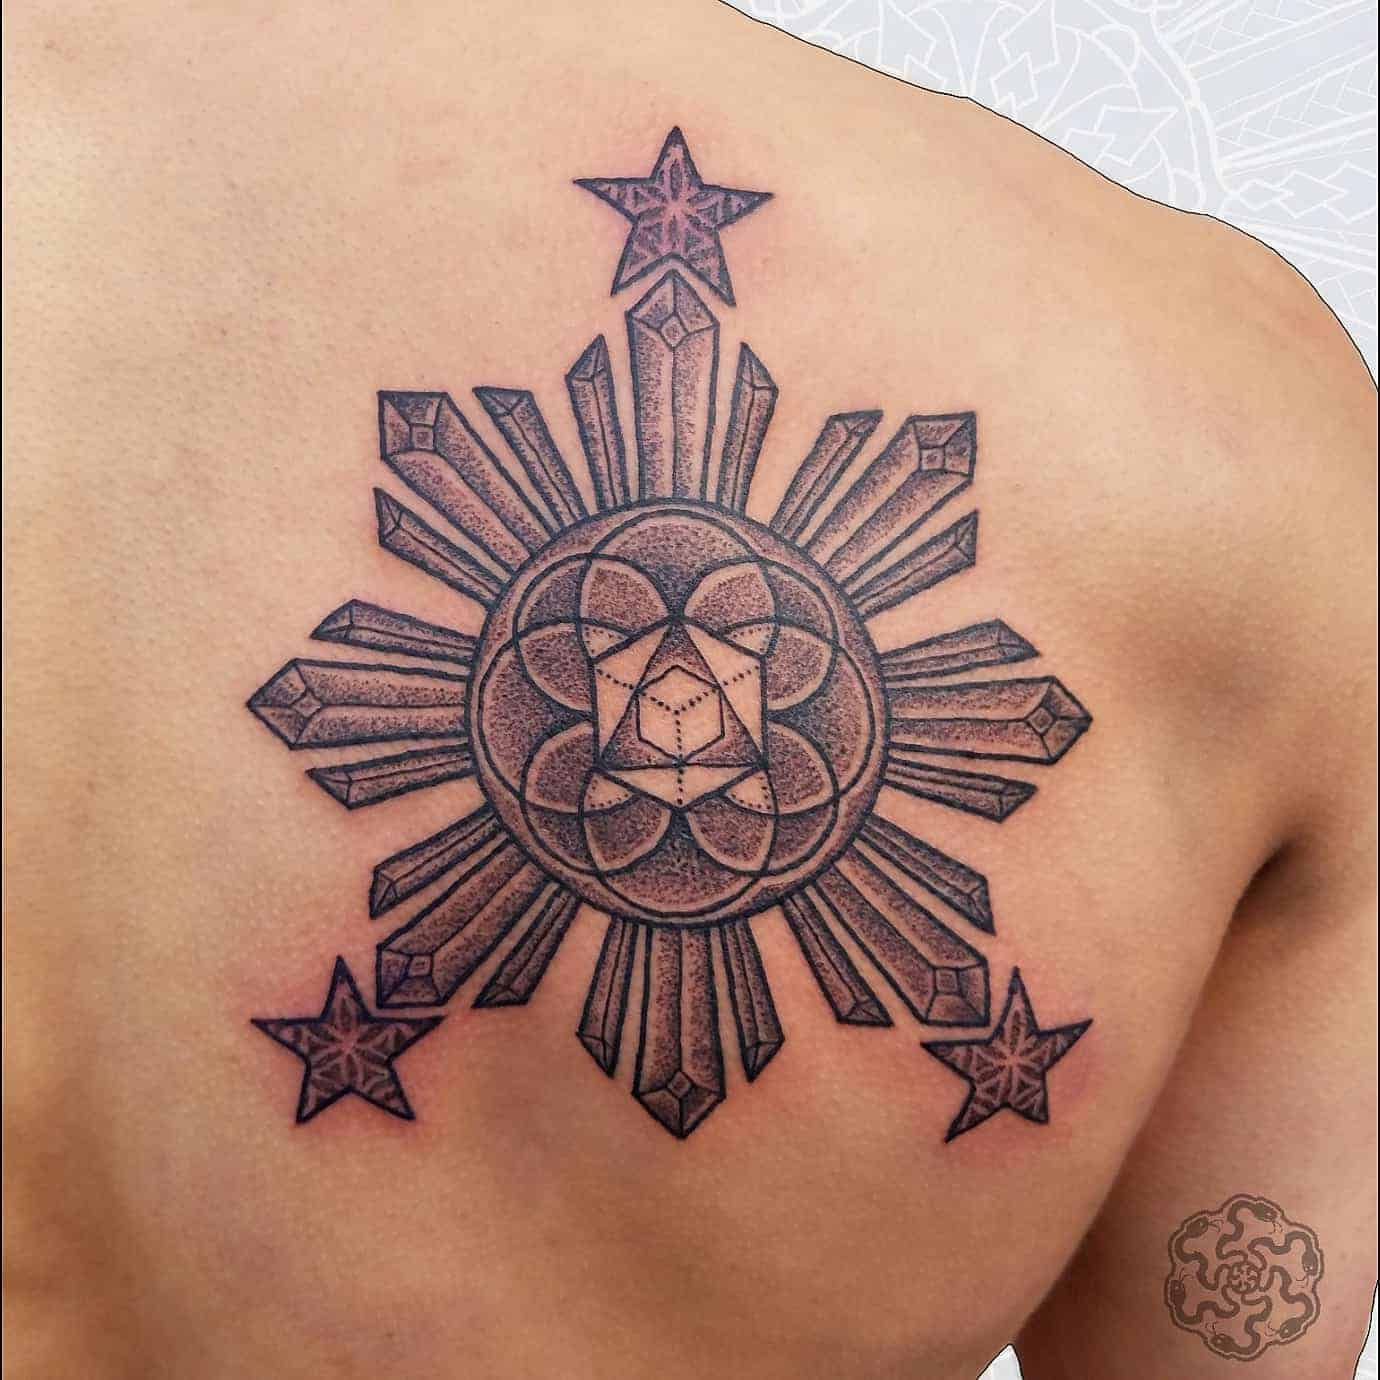 blackwork tattoo of geometric philippino sun on a shoulder